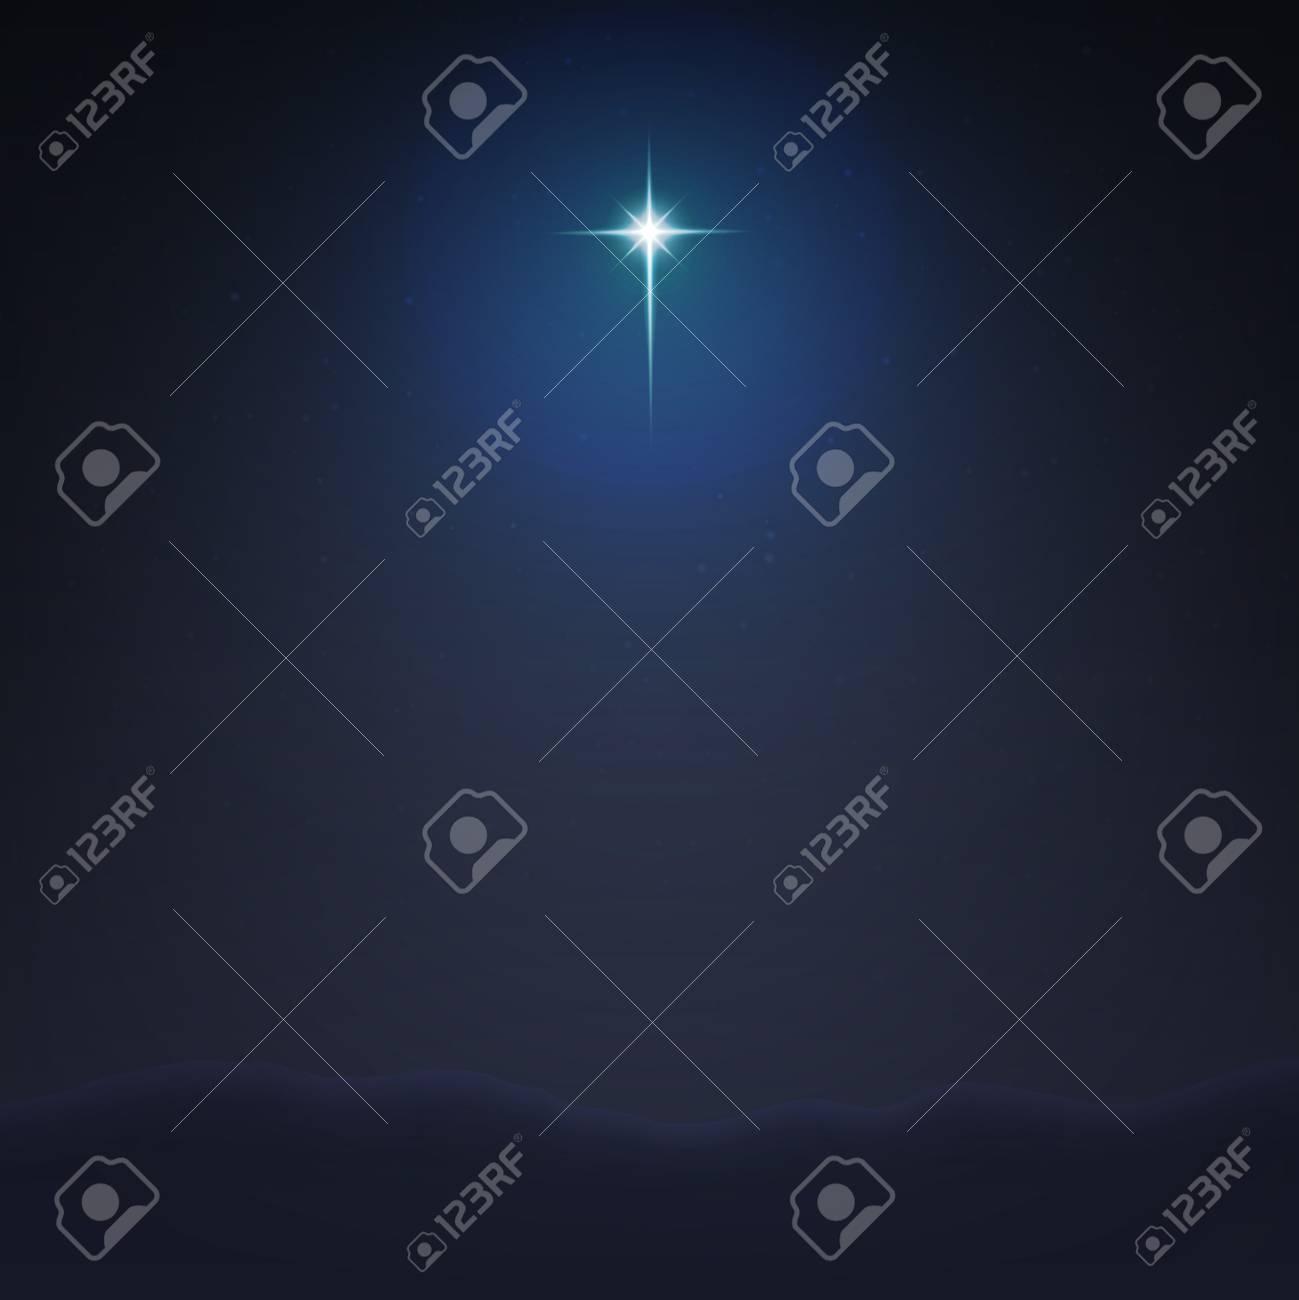 Stock vector illustration Bethlehem Star minimalistic background. The Birth of Jesus Christ. EPS 10 - 104619276